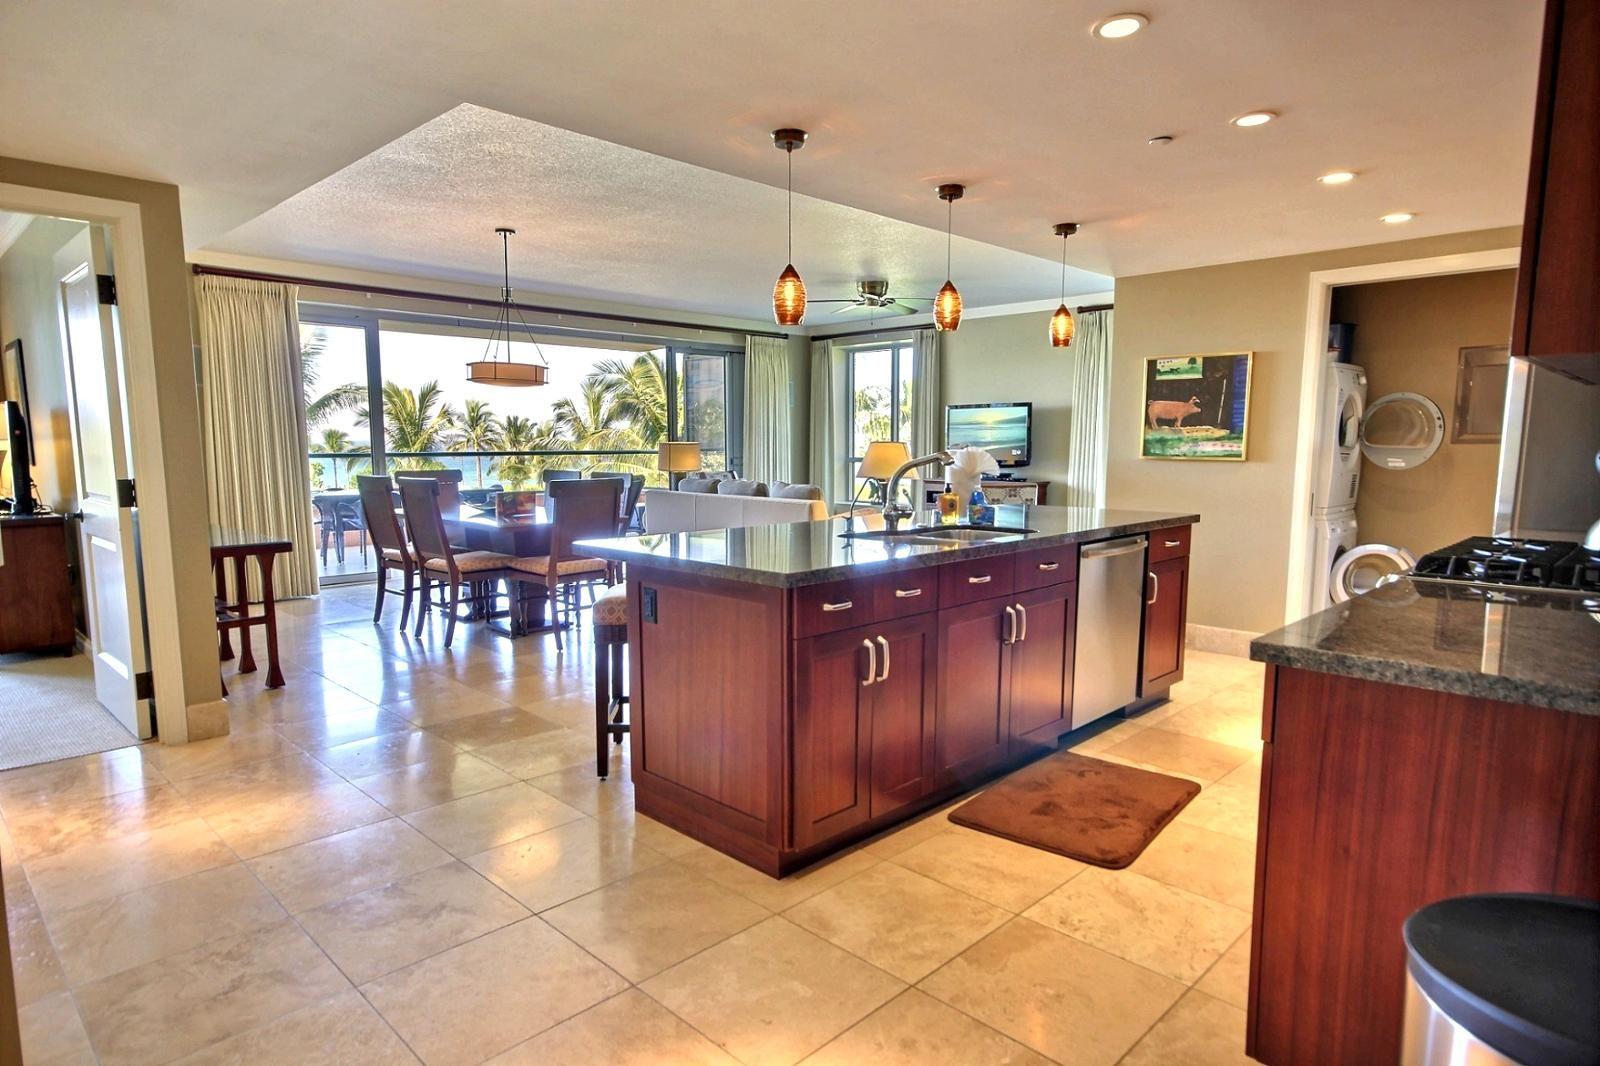 kbm hawaii honua kai hkk 201 luxury vacation rental at rh pinterest com